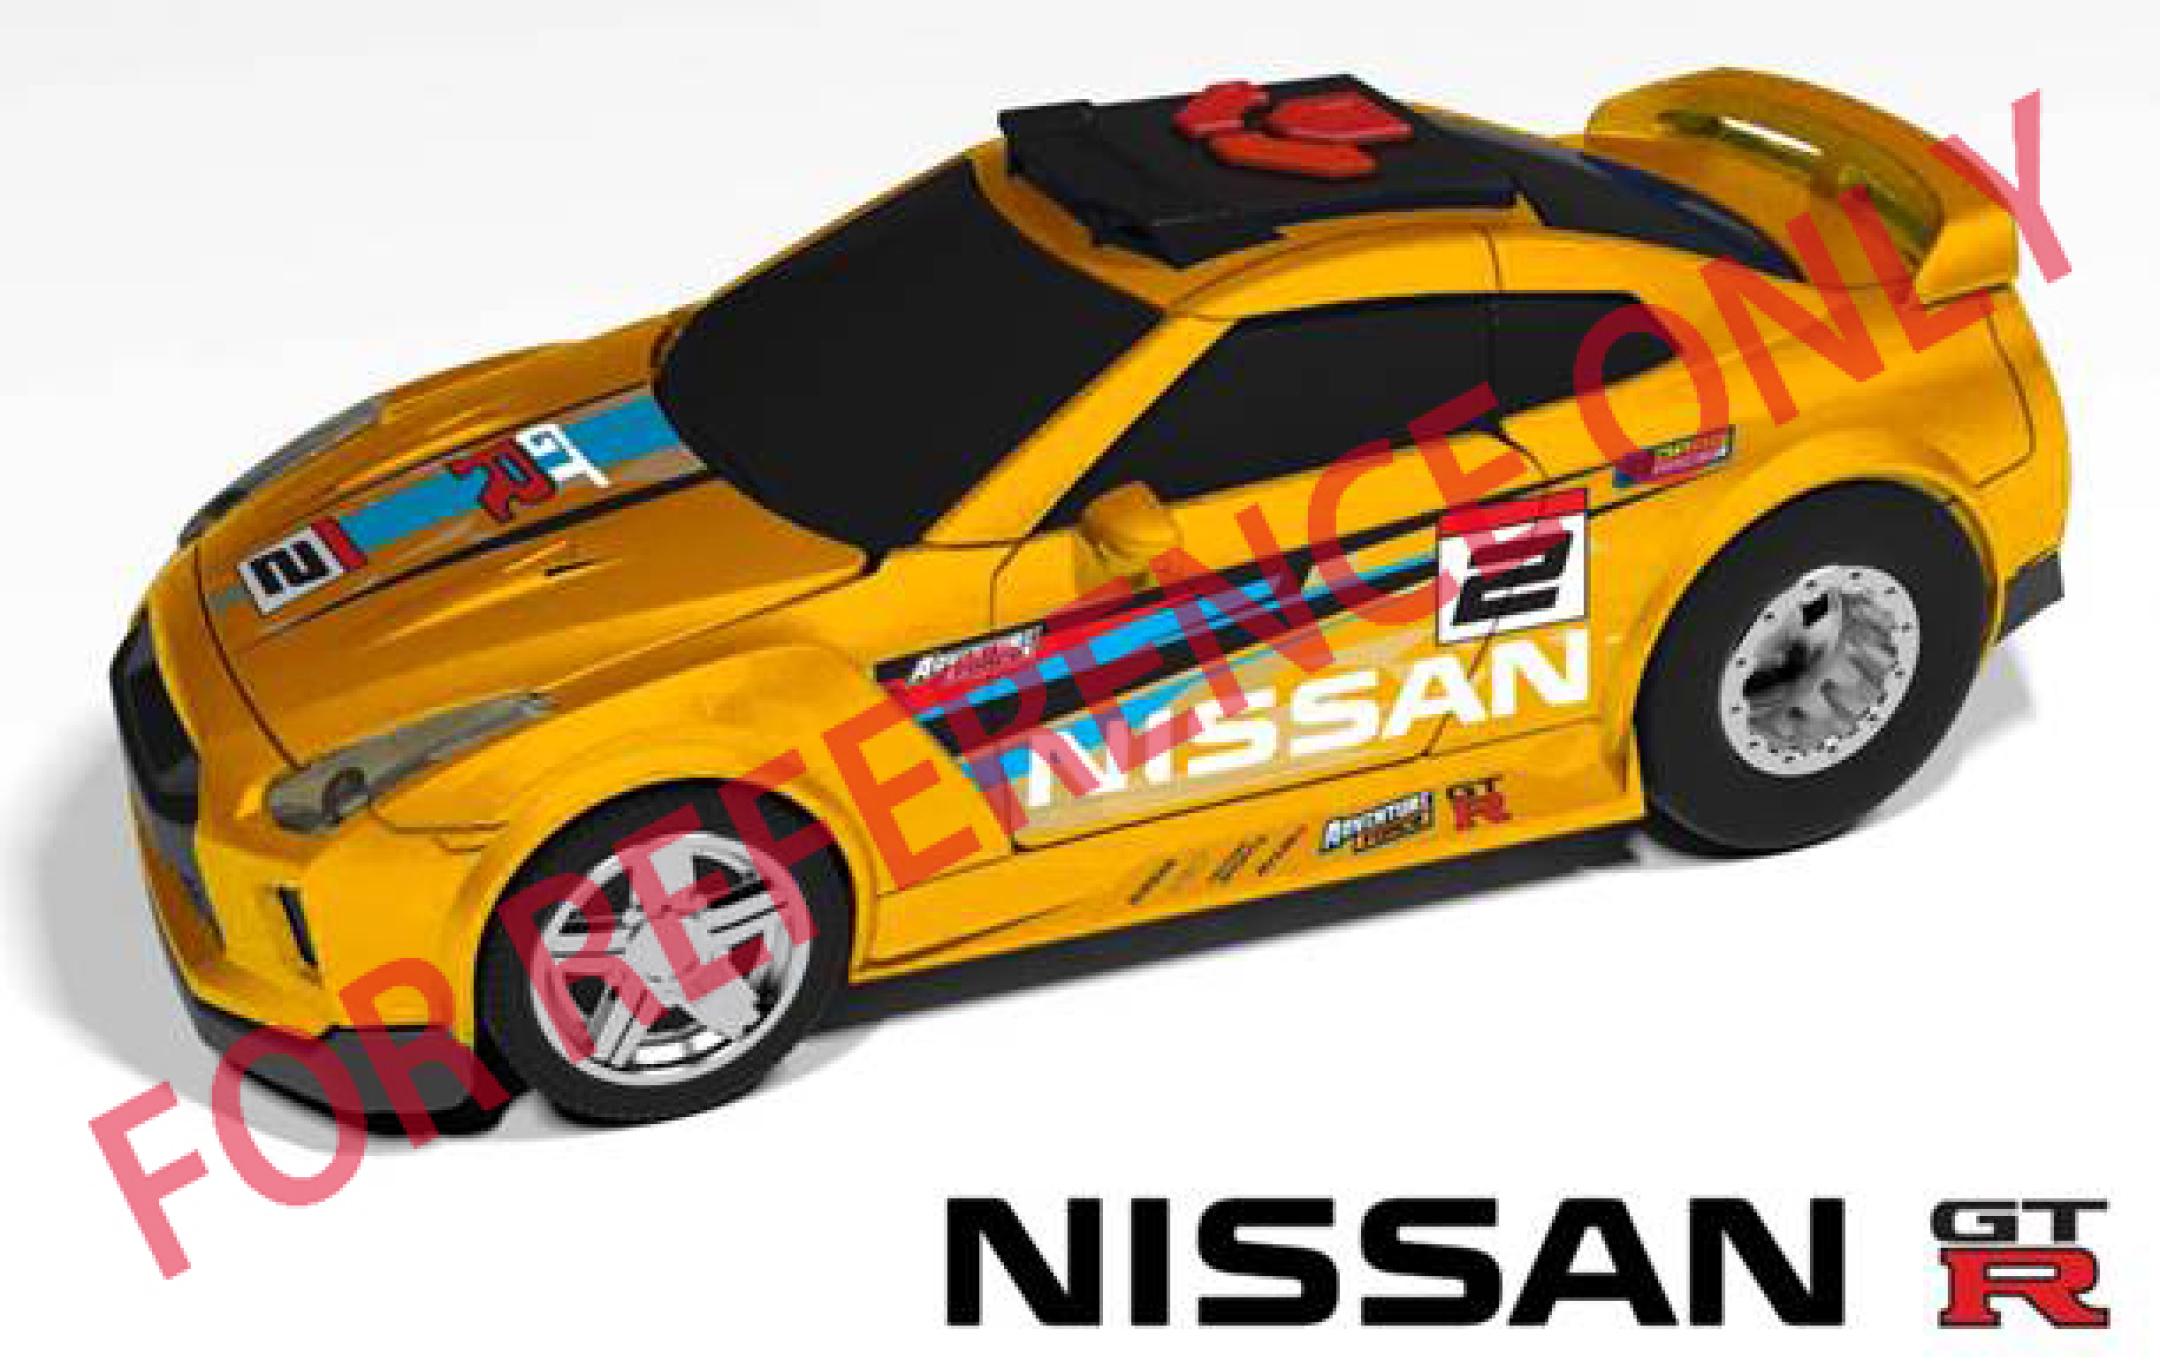 Nissan GTR - Wheelie Raiders